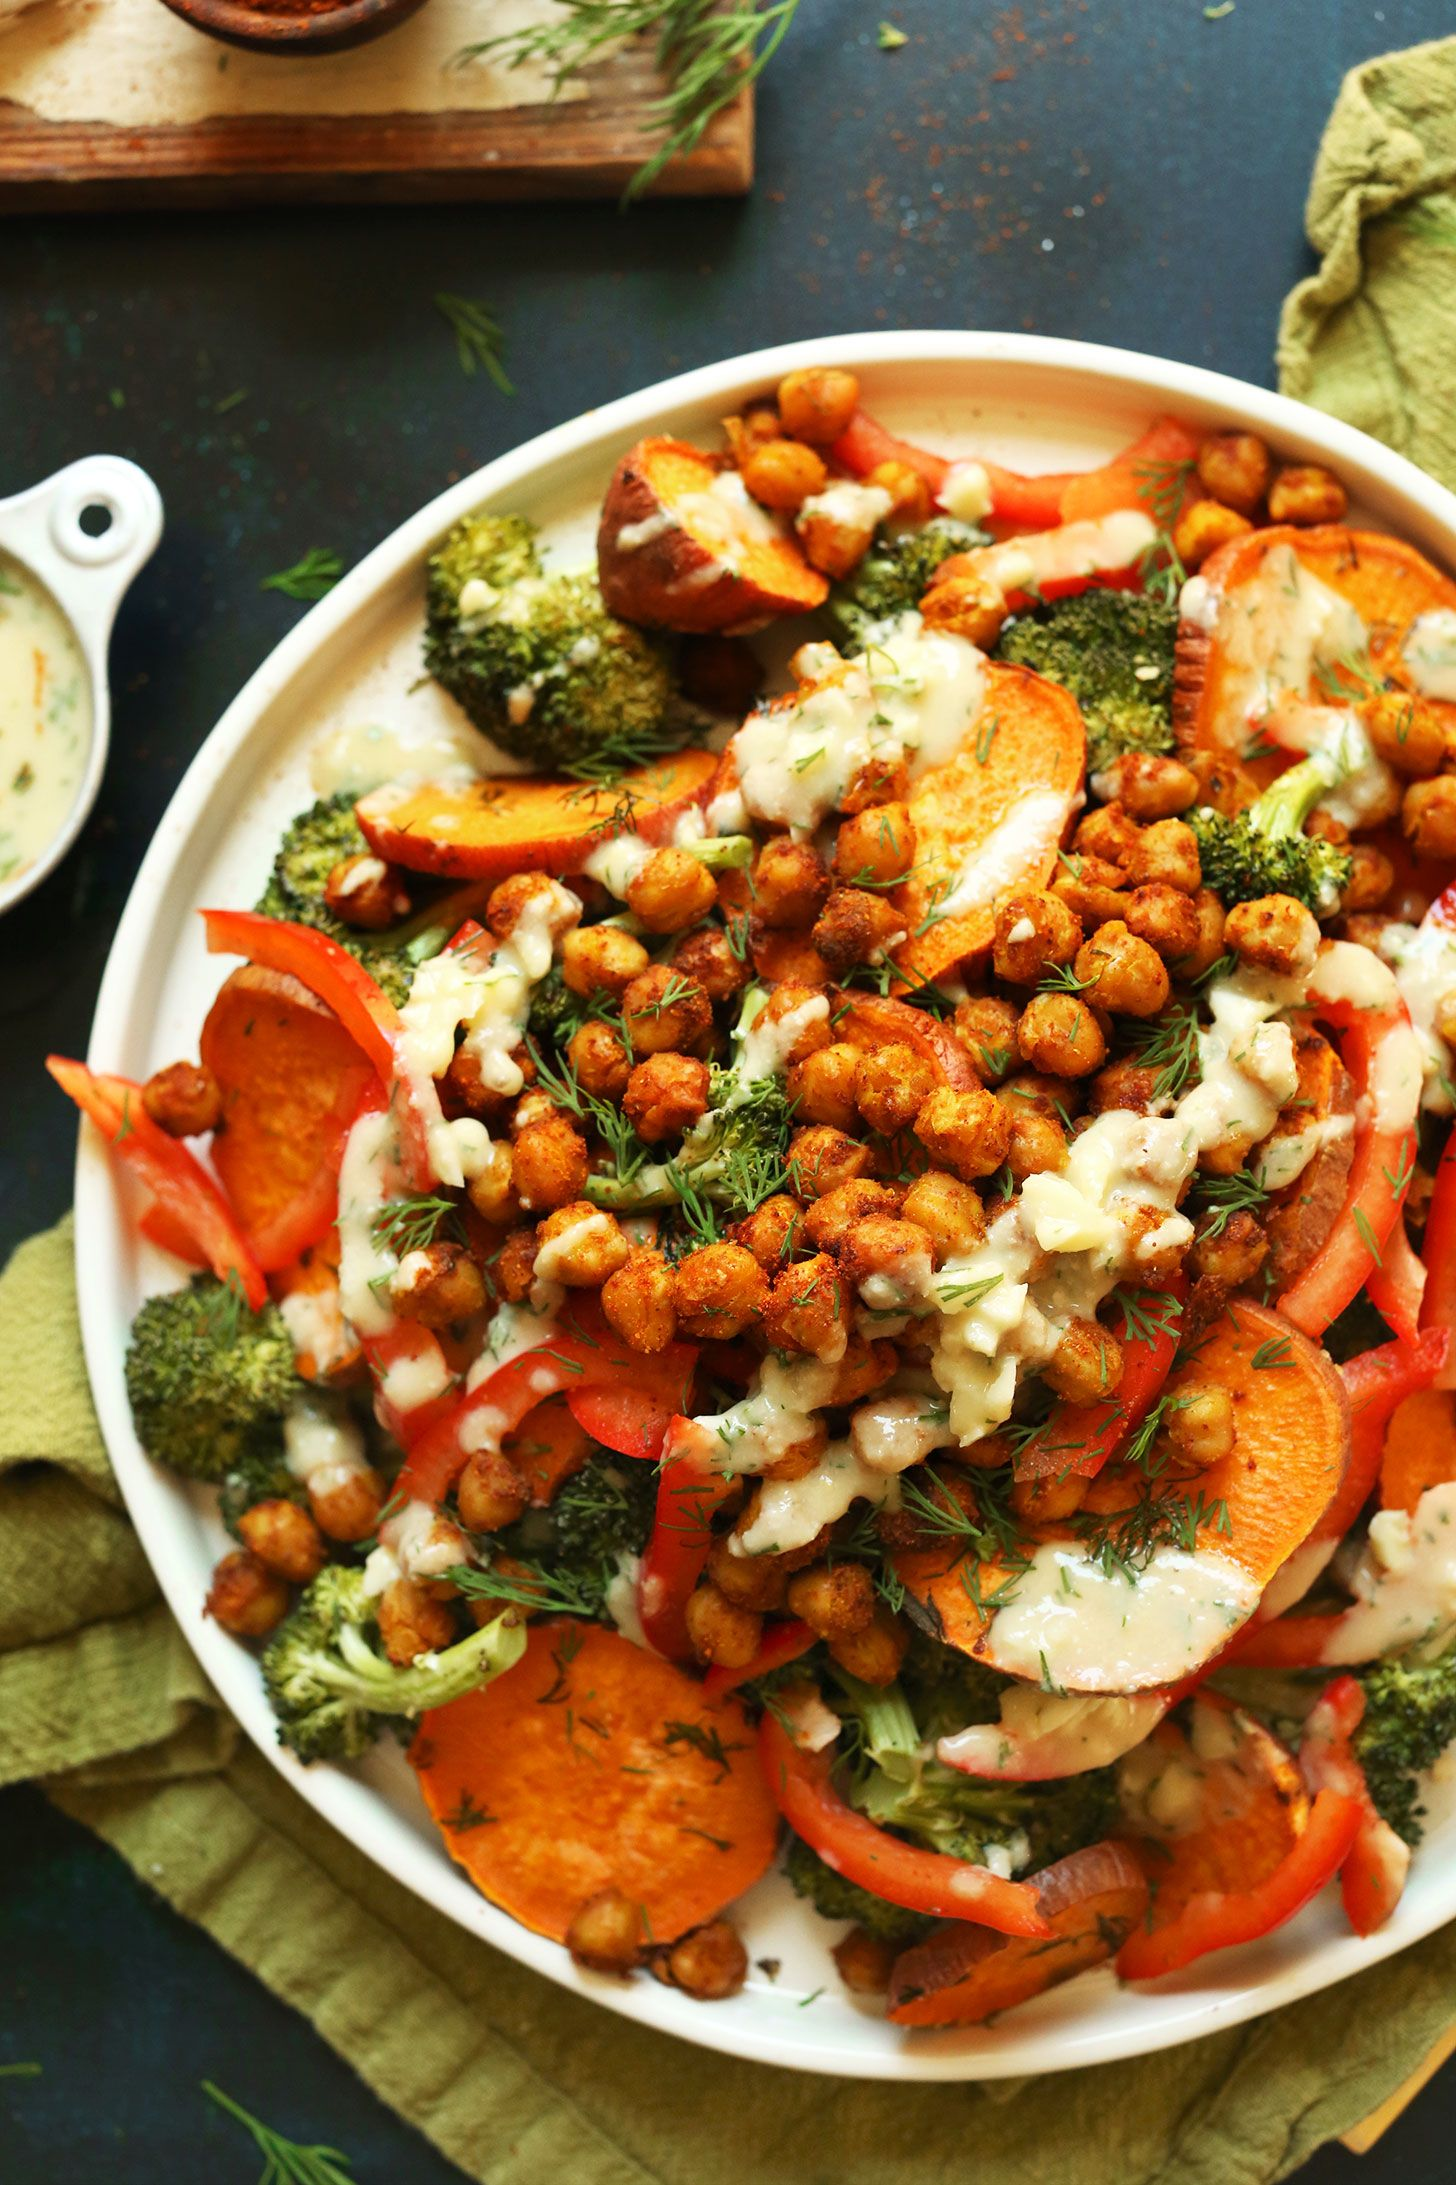 10 Easy Roasted Broccoli Recipes How To Roast Broccoli